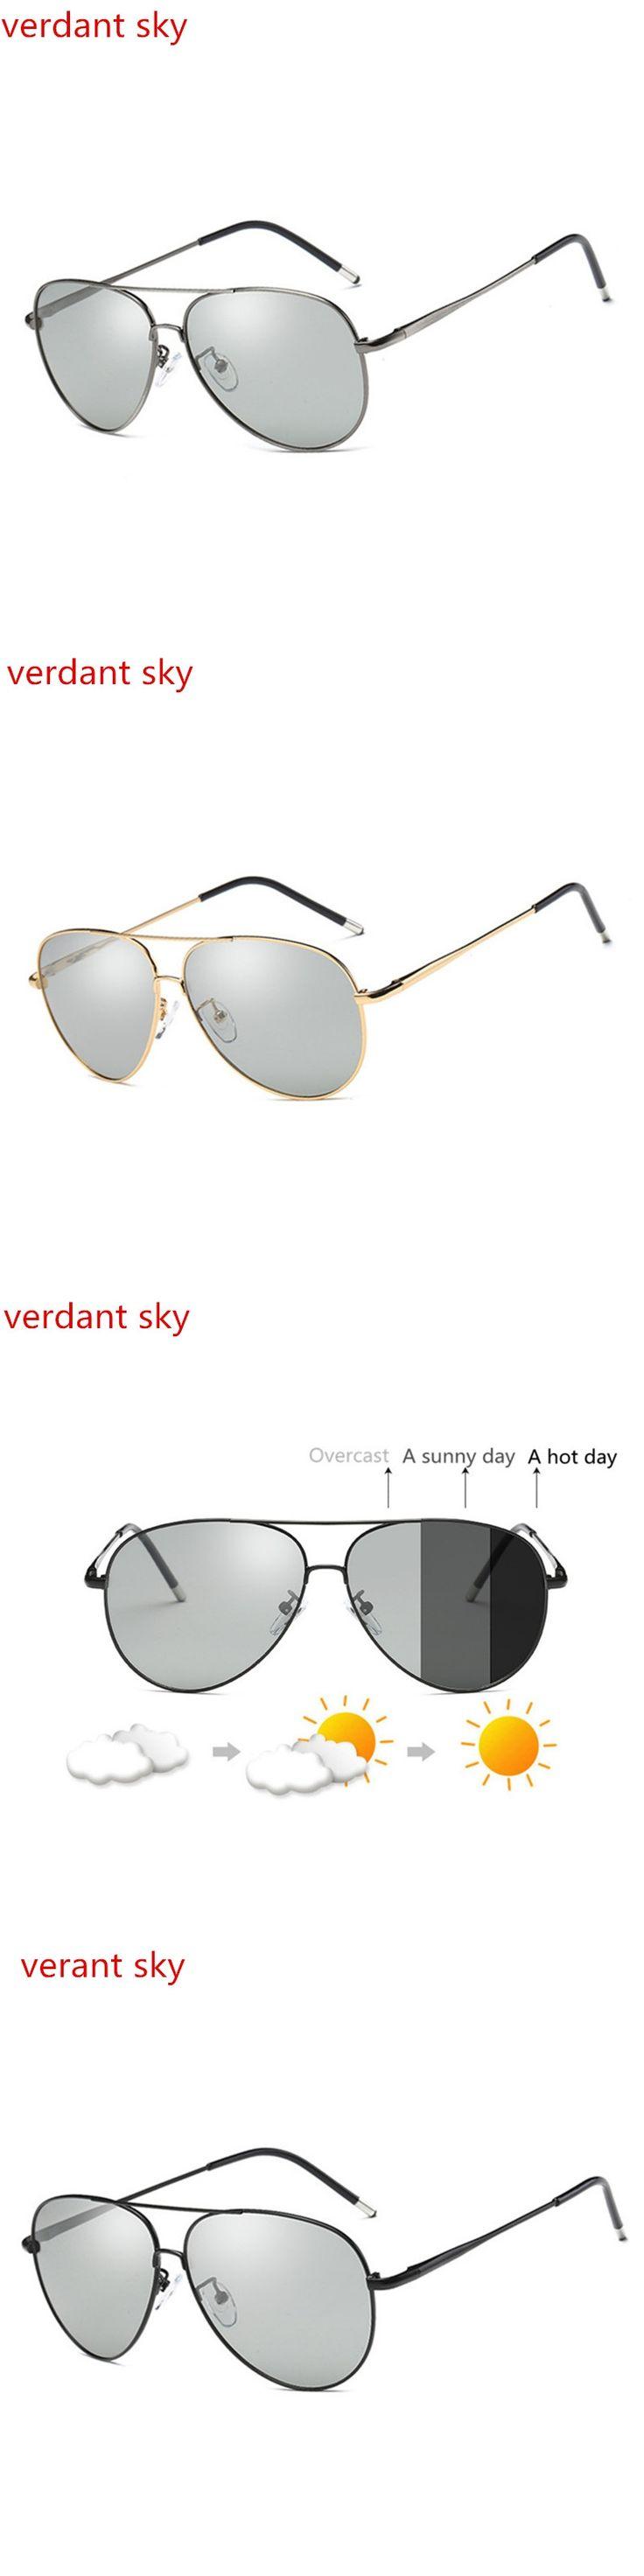 2017 New flight Unisex Photochromic Sunglasses Driving Eyewear Men  Men Eyeglasses Women TV Computer Goggles Reson Lens Original